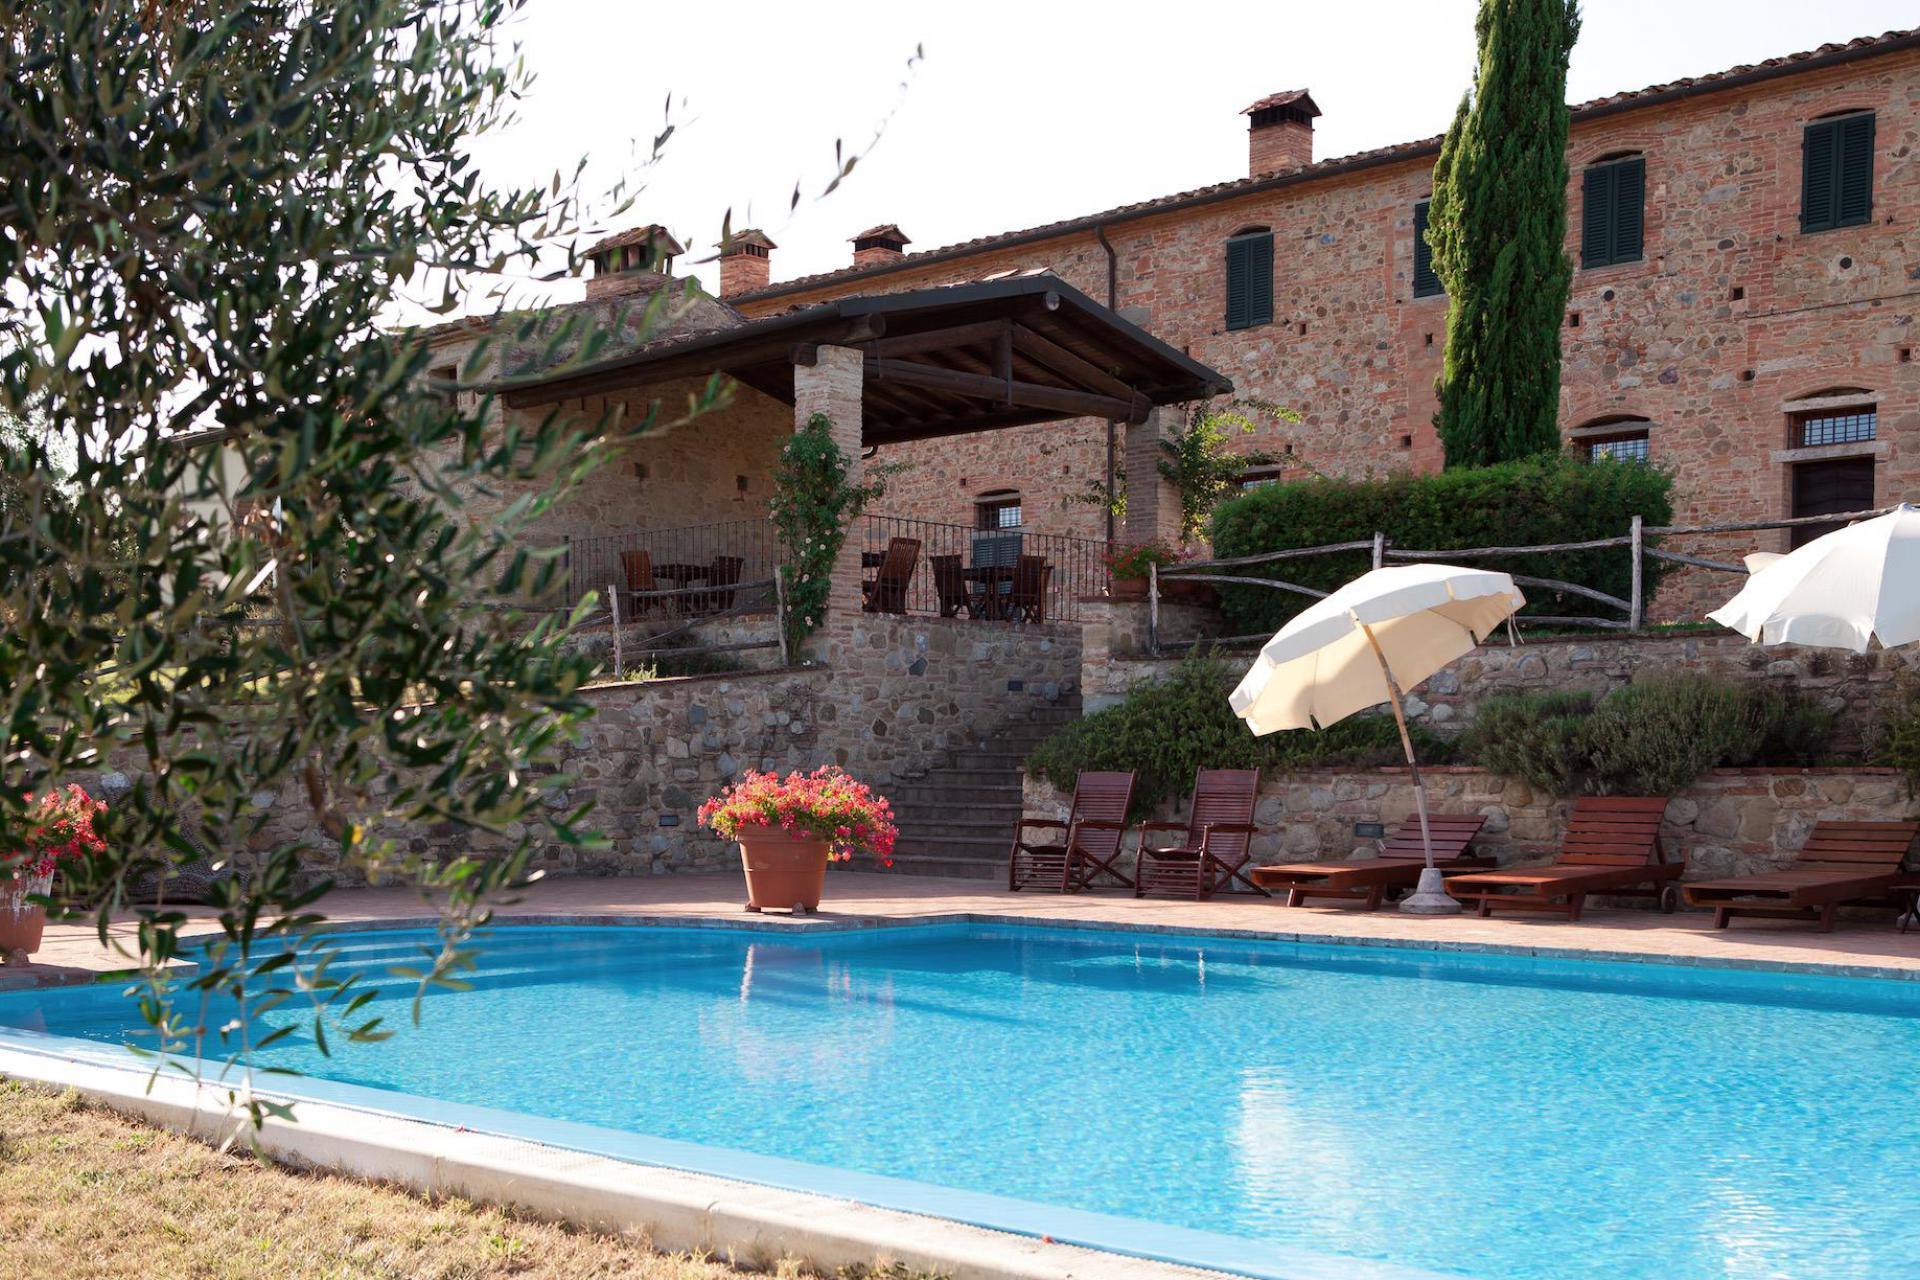 Agriturismo Toscane Biologische agriturismo vlakbij Montepulciano in Toscane